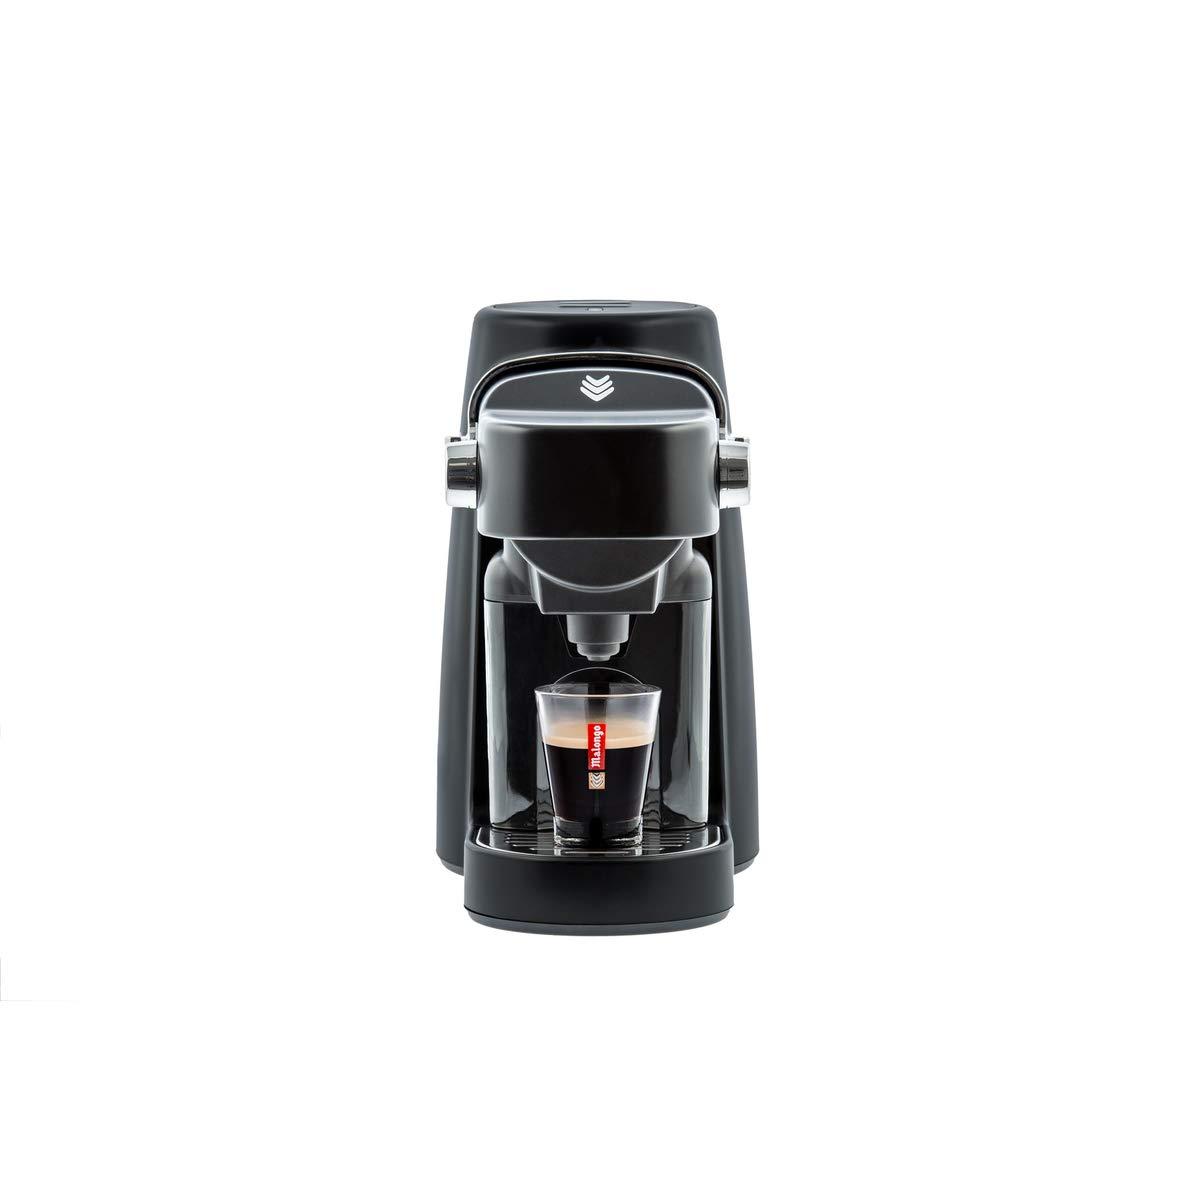 Malongo 802913 - Cafetera (Independiente, Máquina espresso, 1,2 L ...